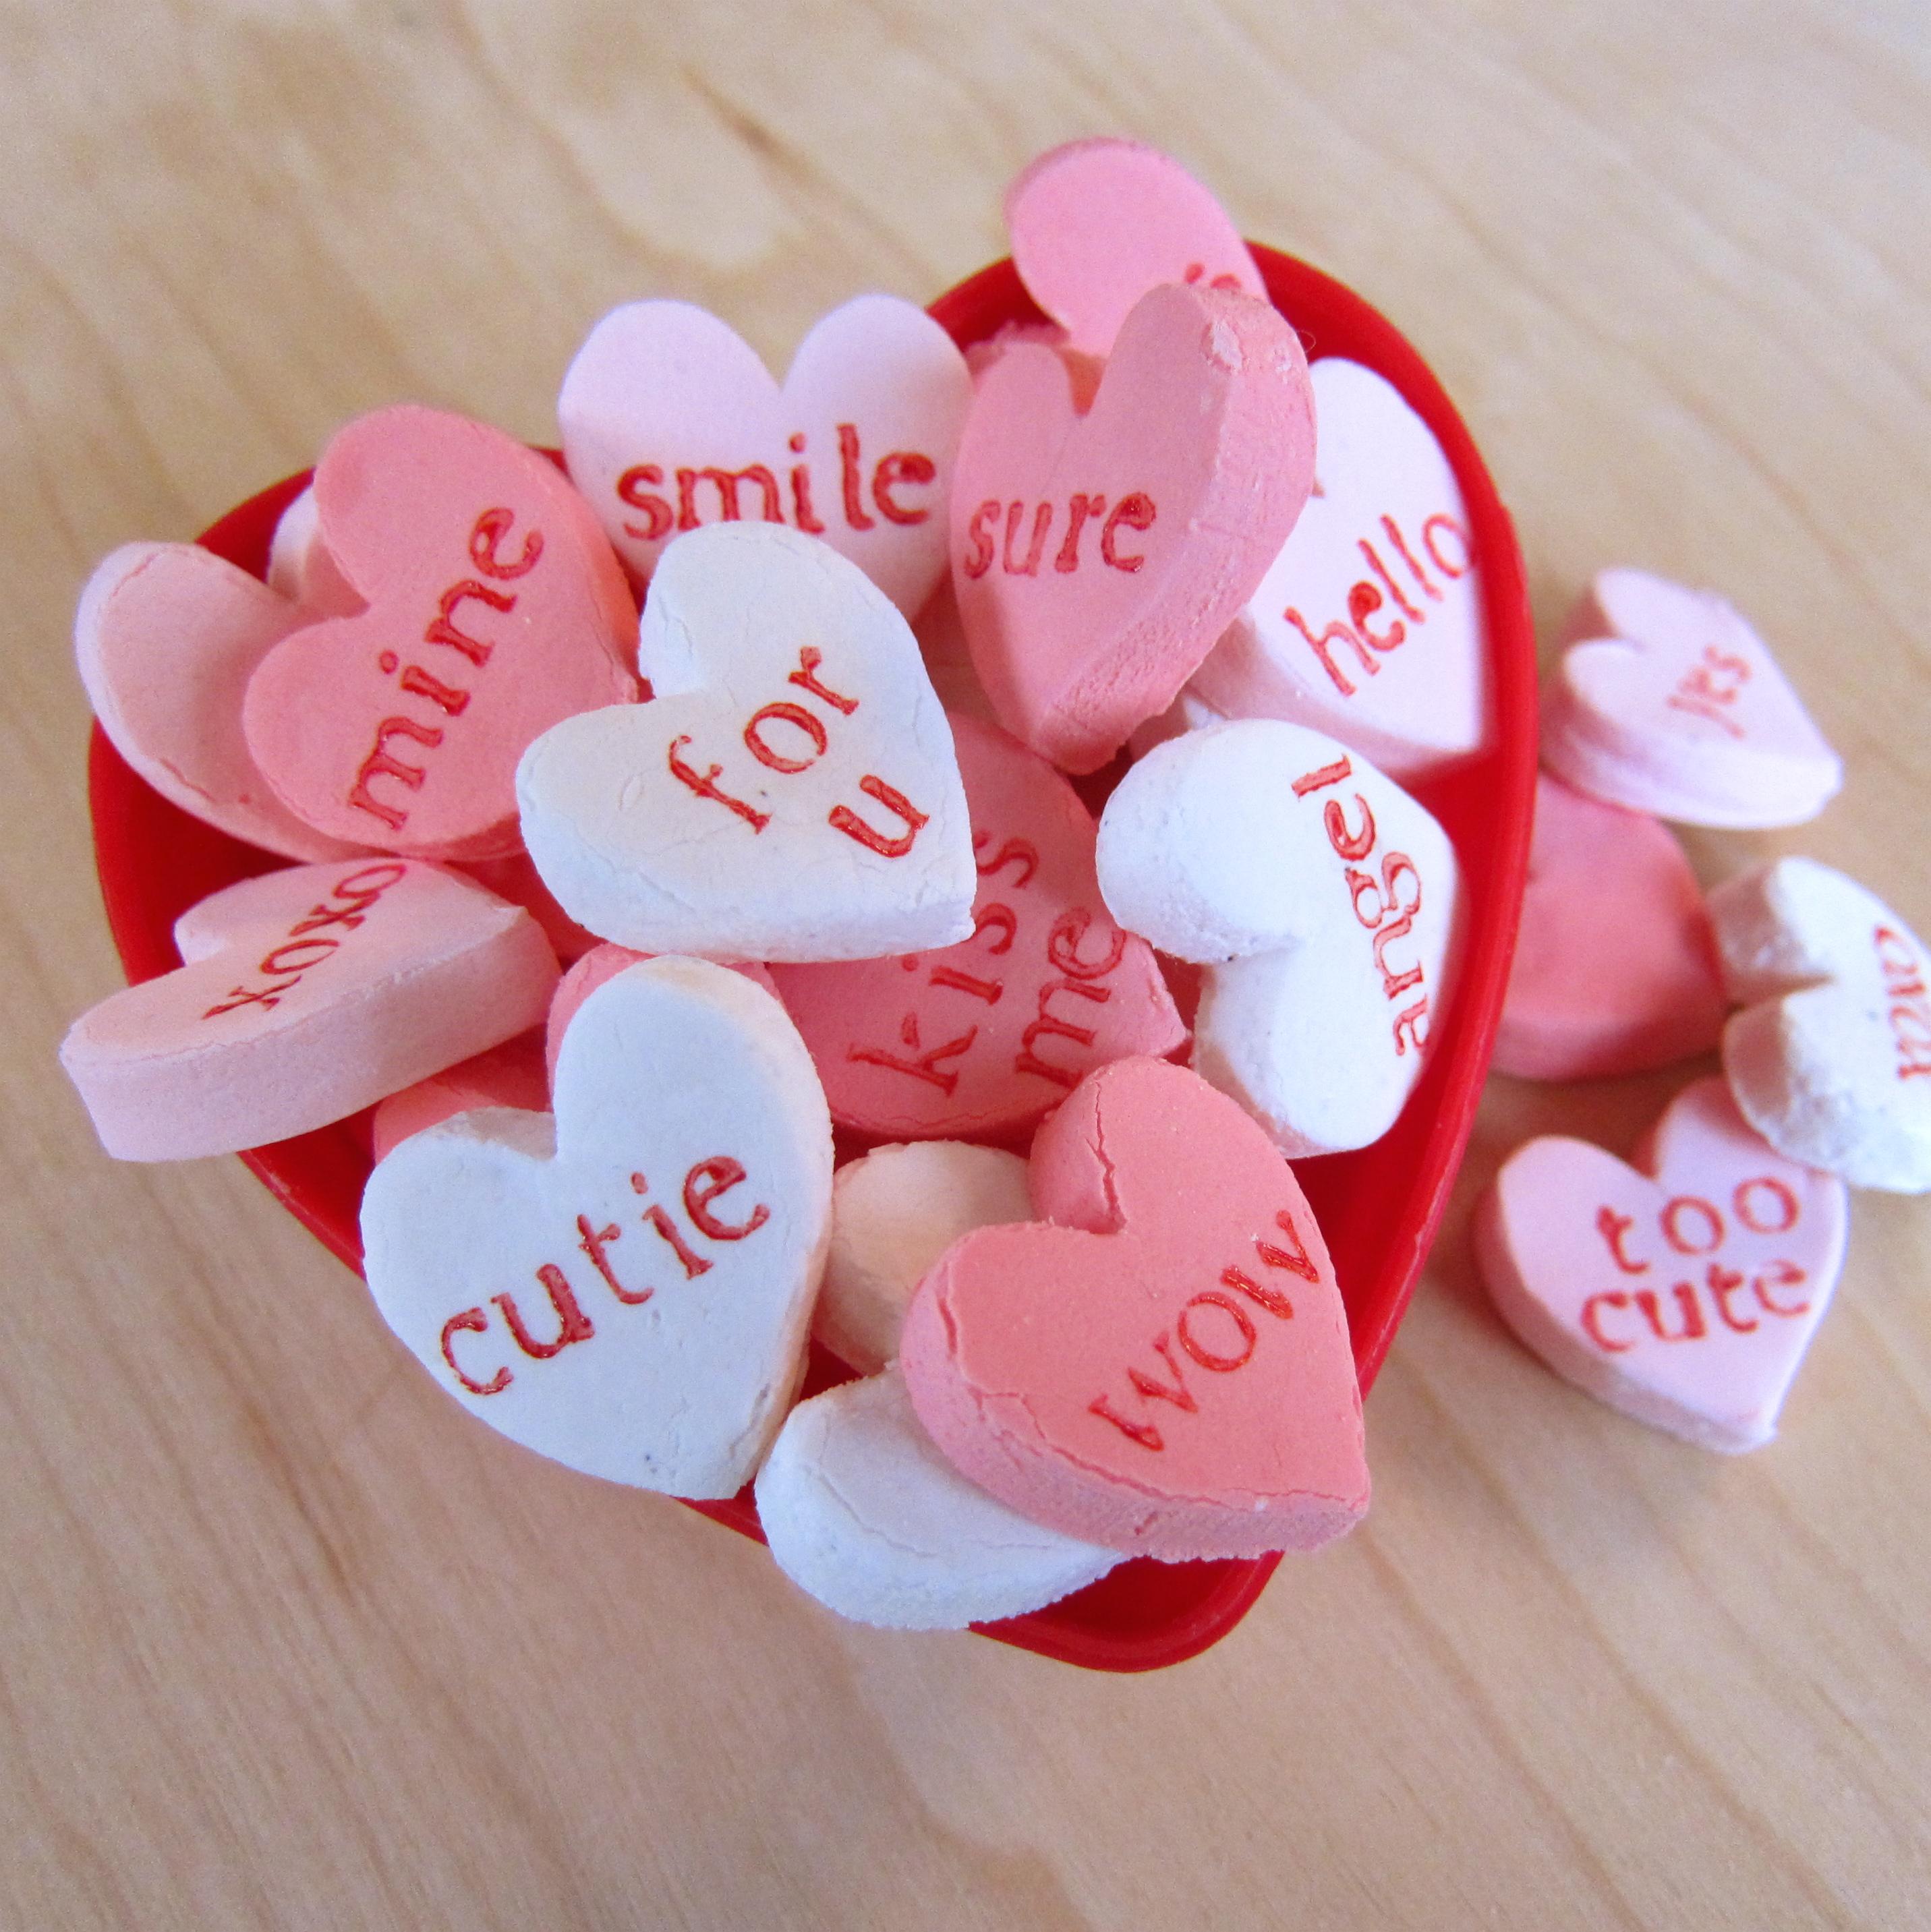 Homemade Candy (Conversation) Hearts